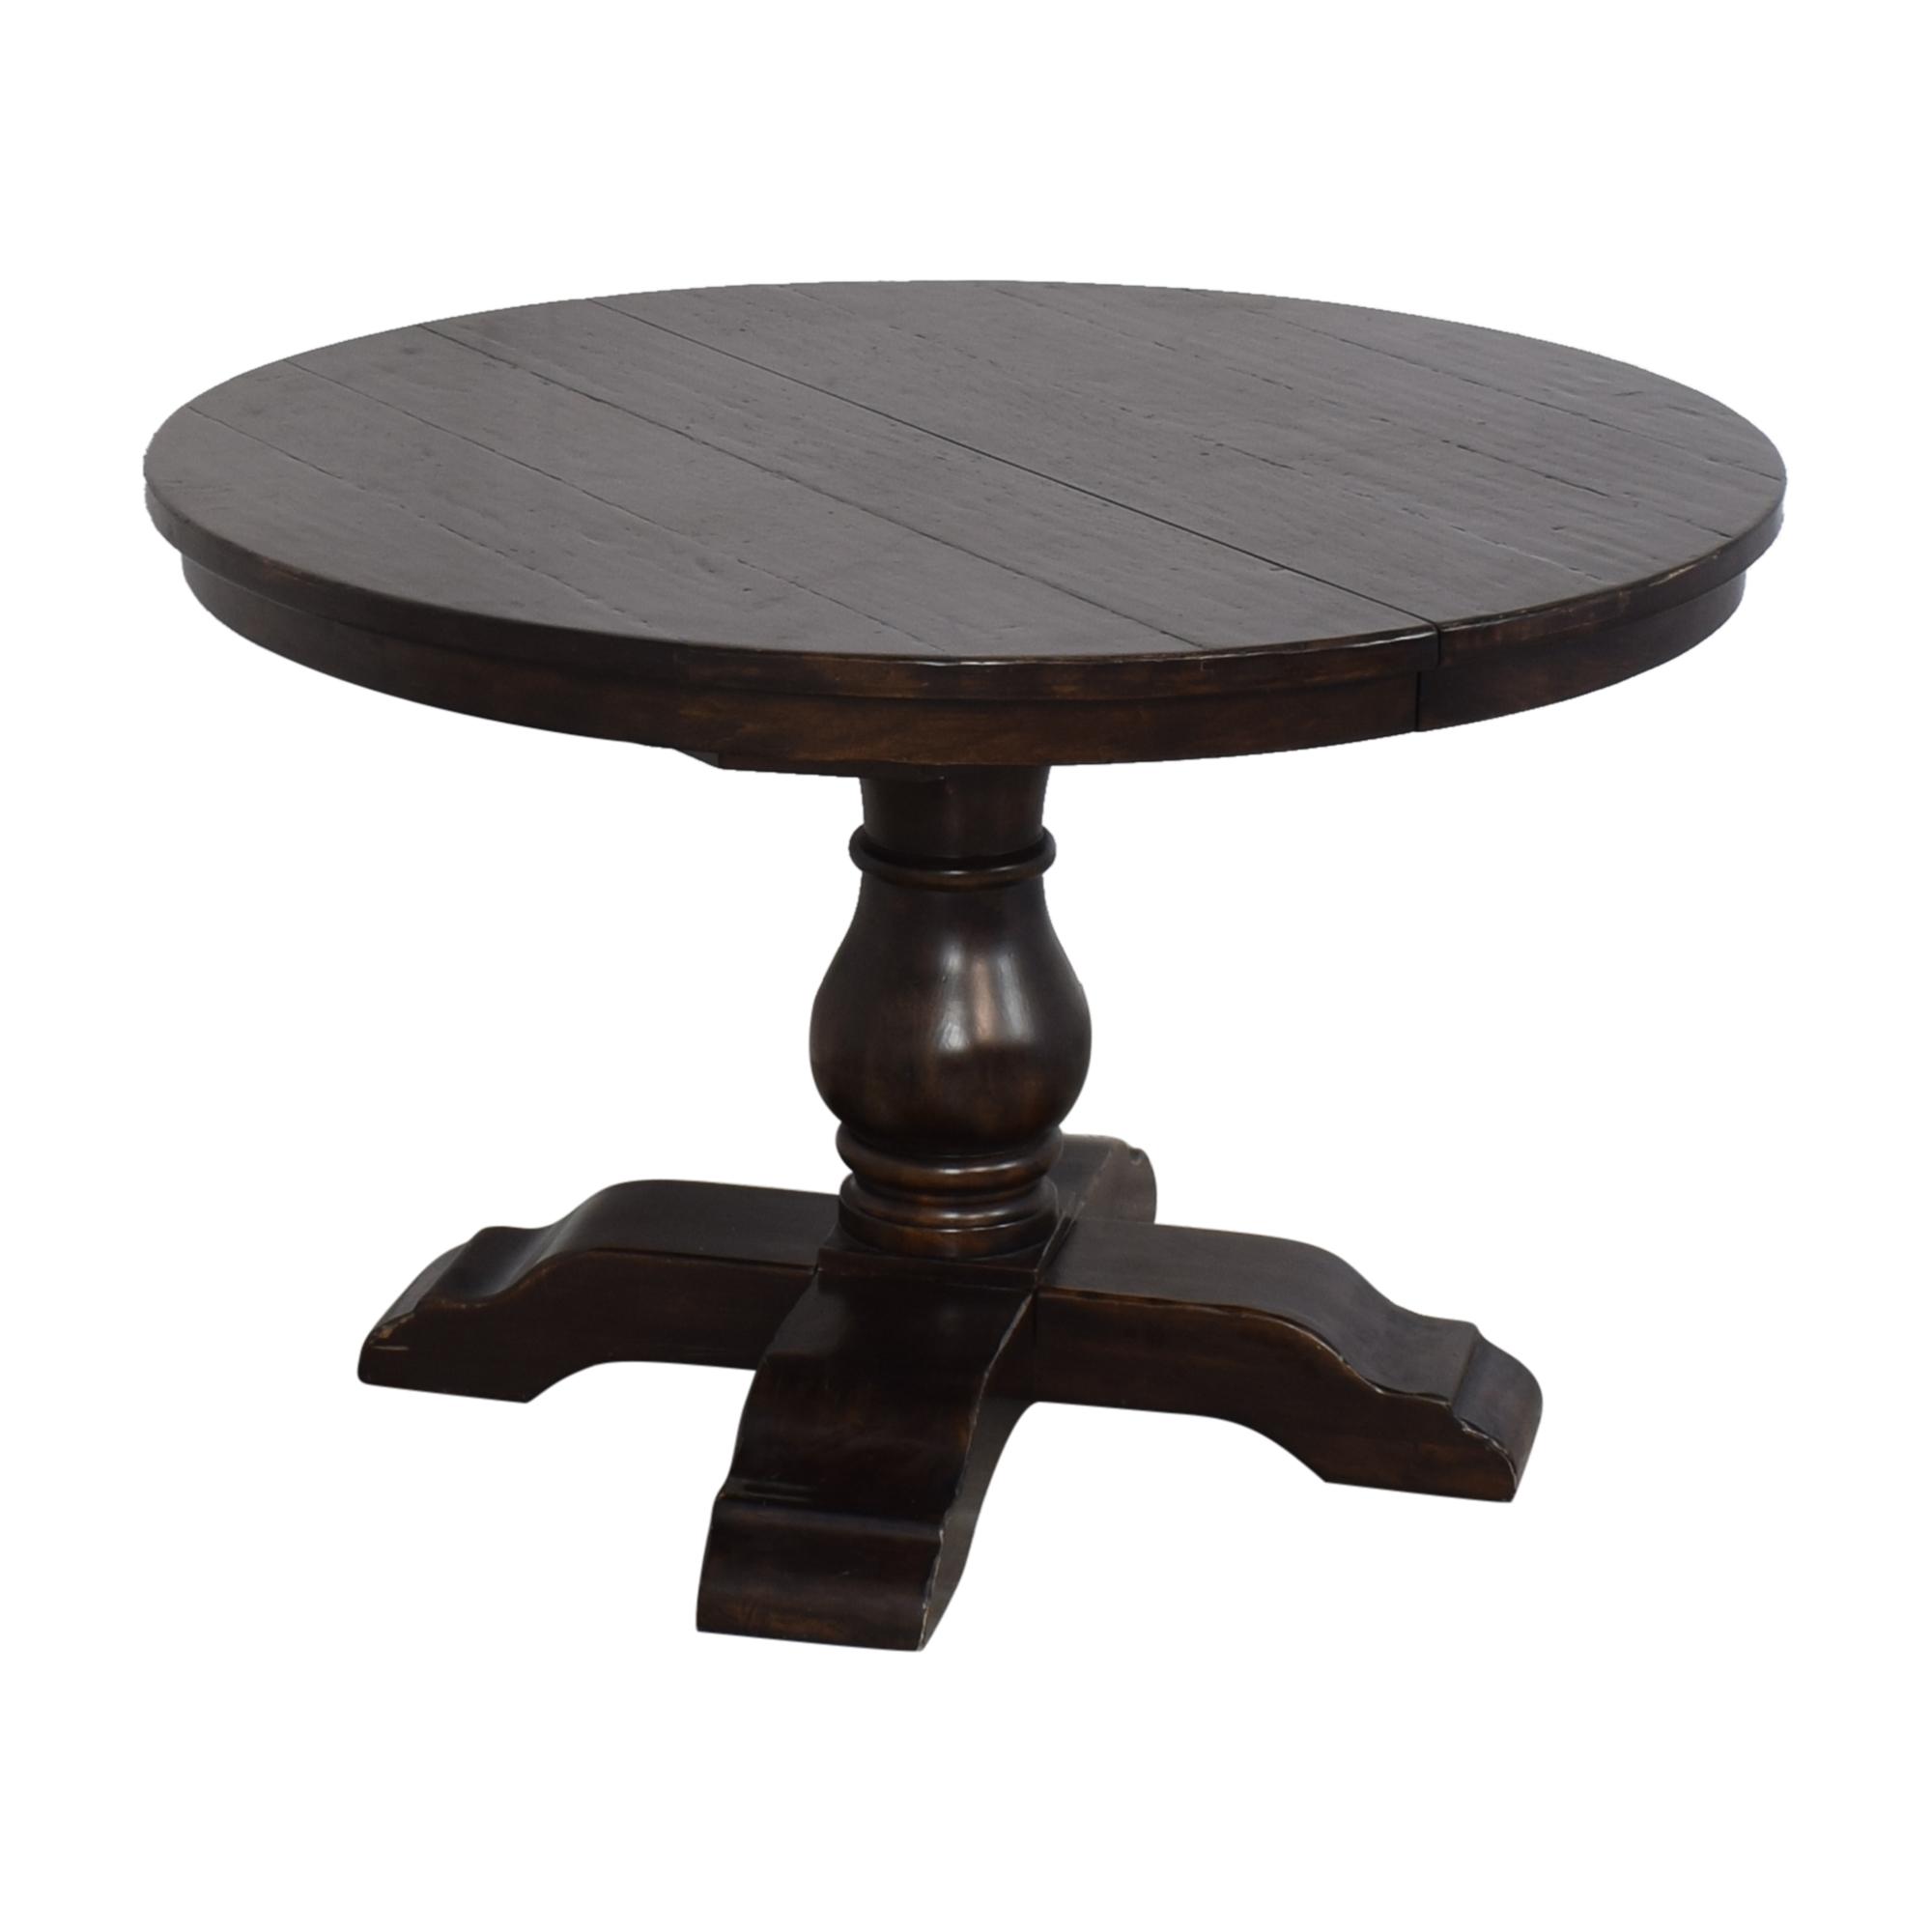 3% OFF - Pottery Barn Pottery Barn Cortona Extending Pedestal Dining Table  / Tables